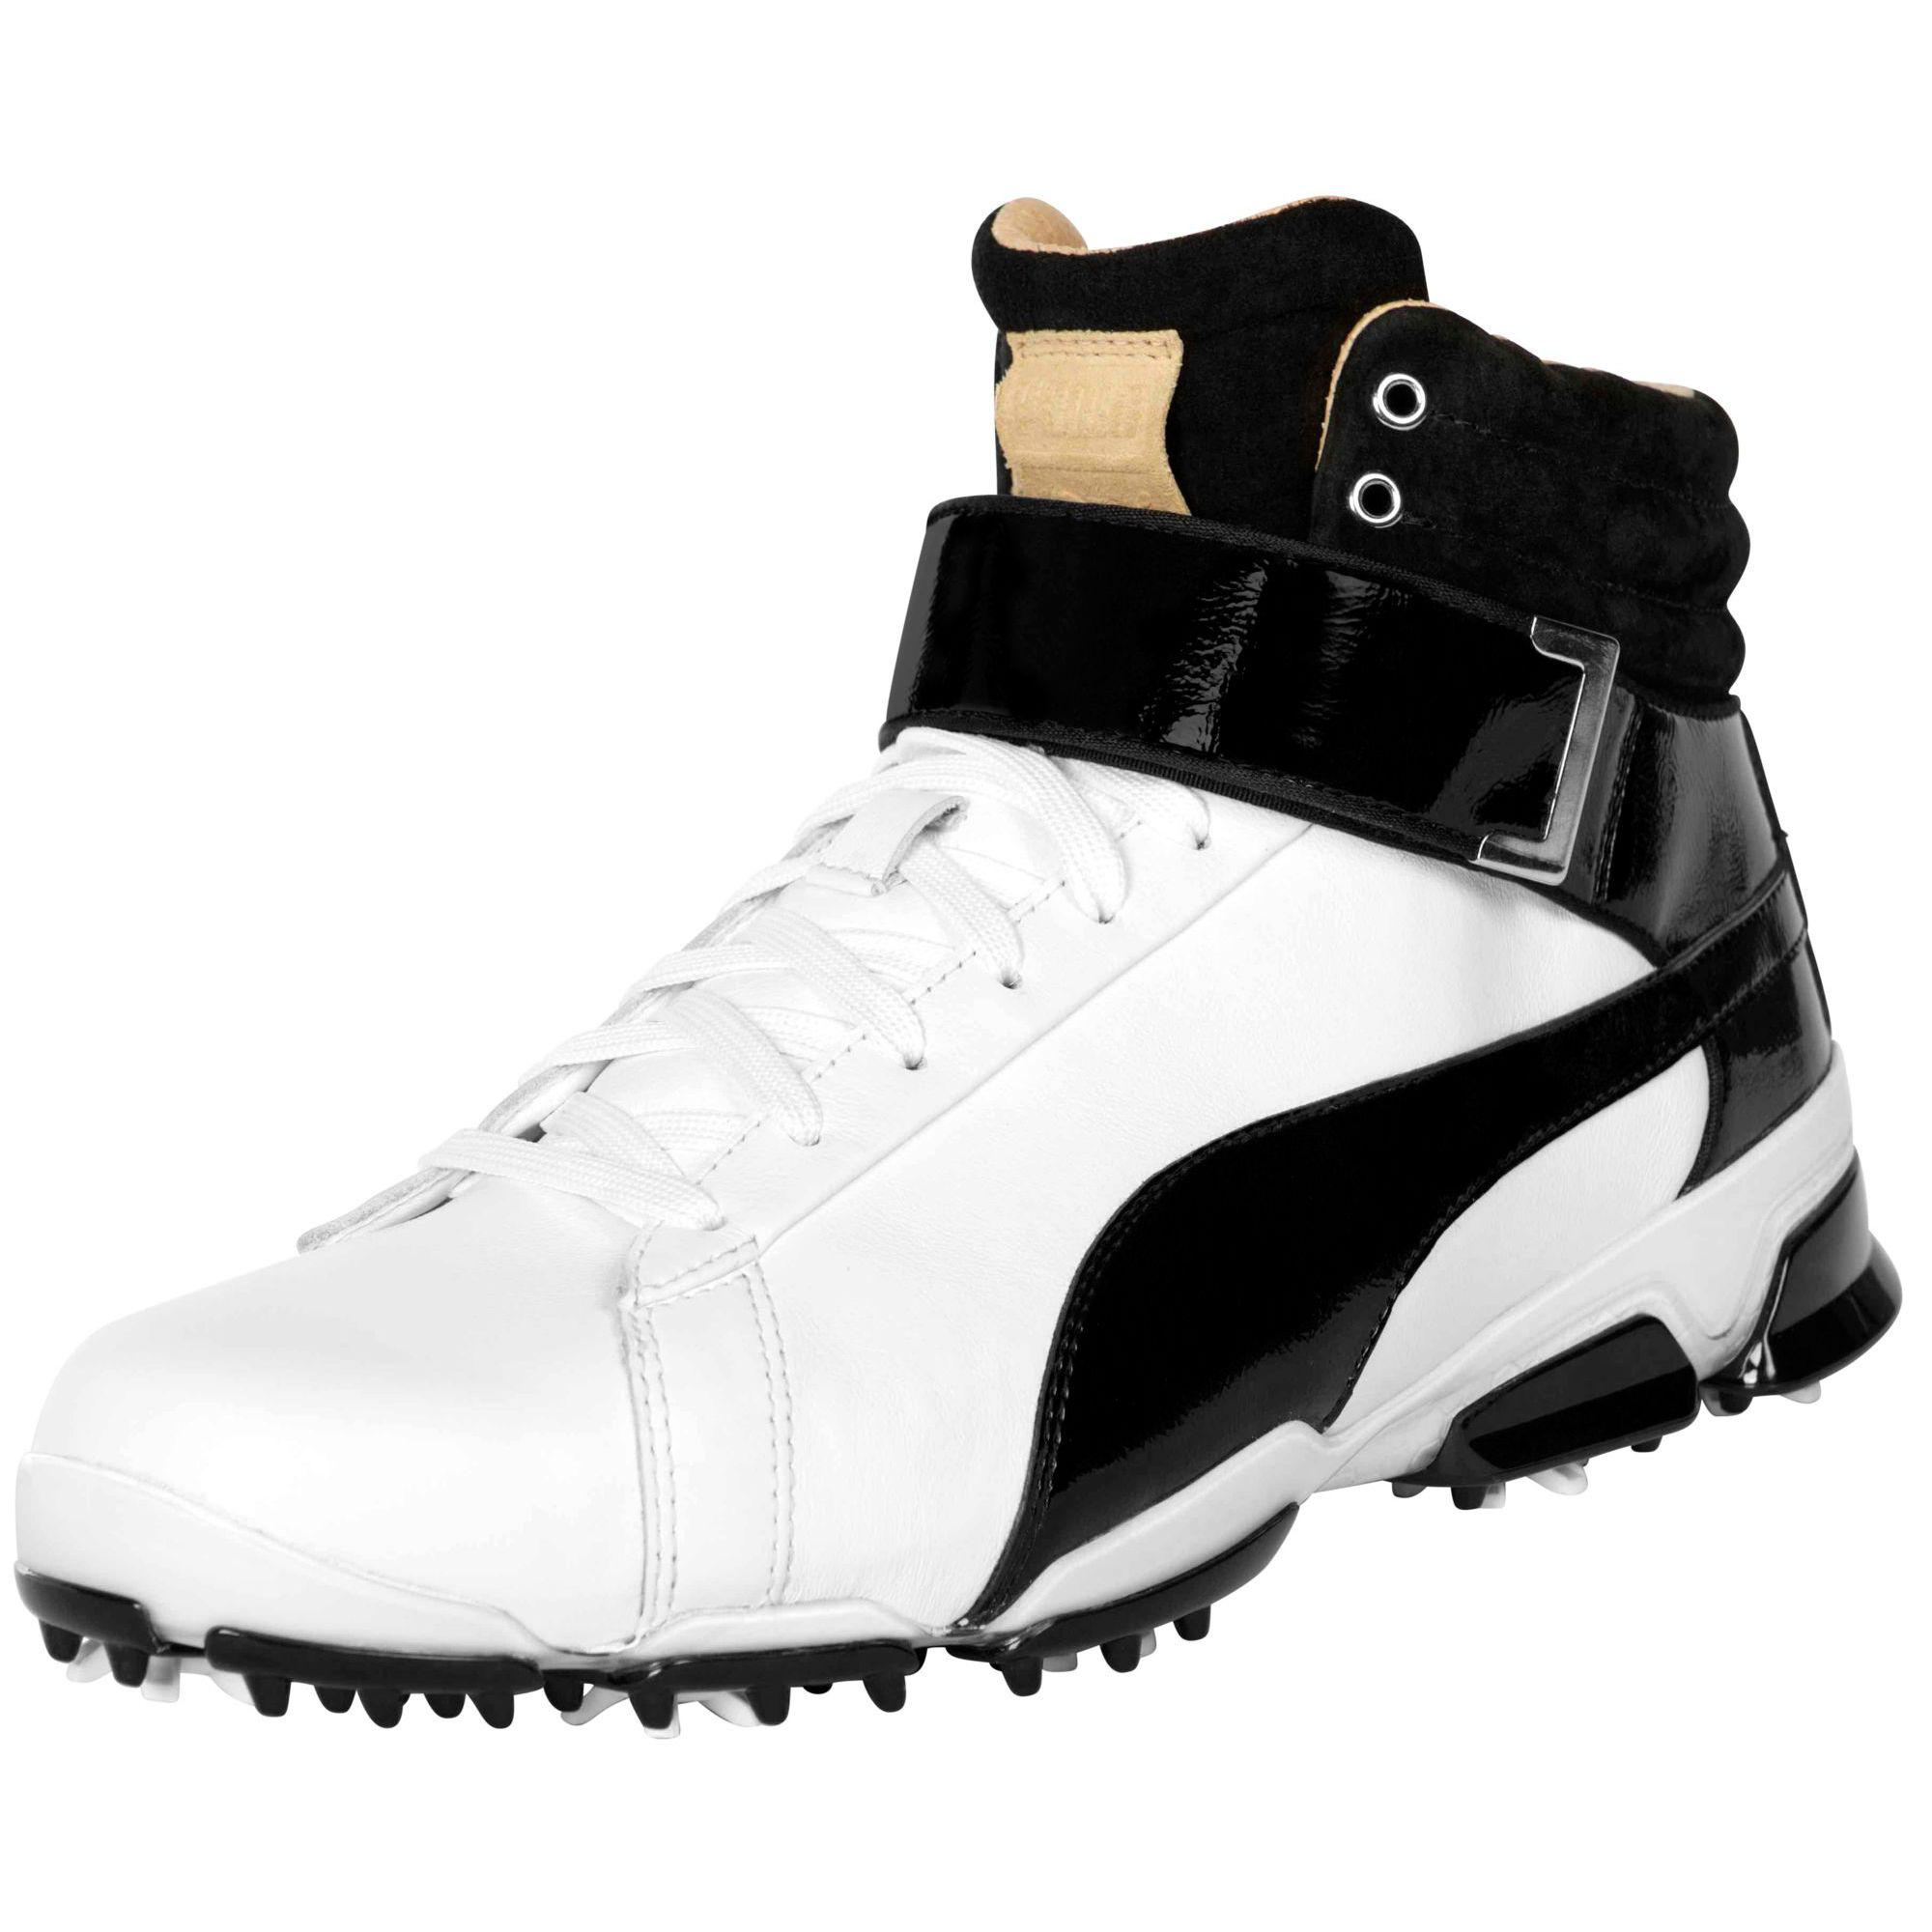 Lyst - Puma Titantour Ignite High-top Men's Golf Shoes in ...